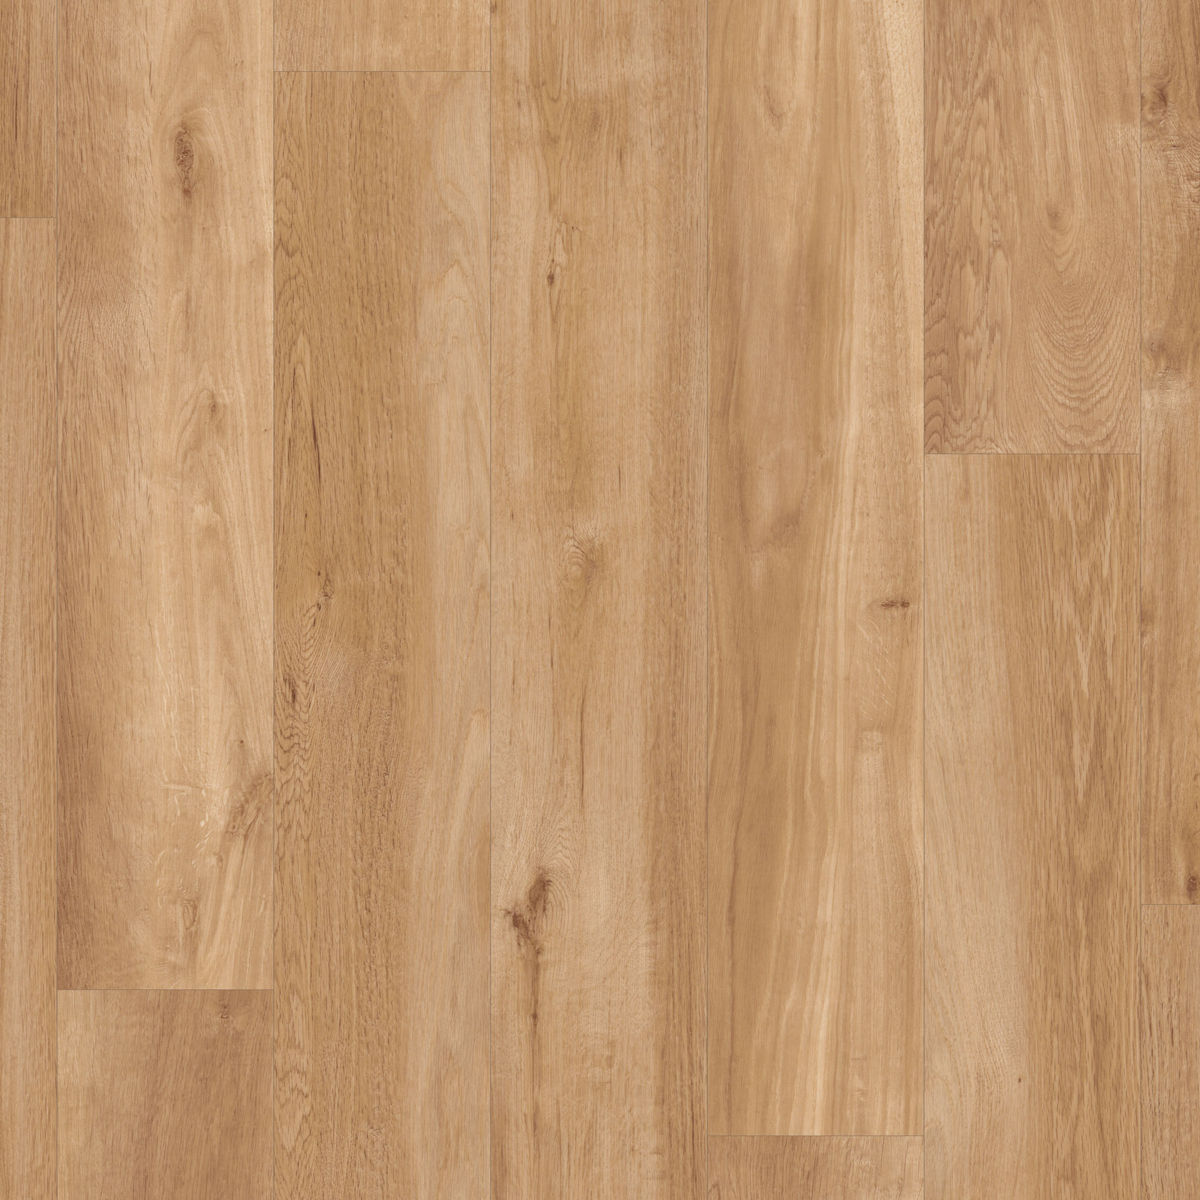 Flooring Vinyl Wood 2017 2018 Cars Reviews